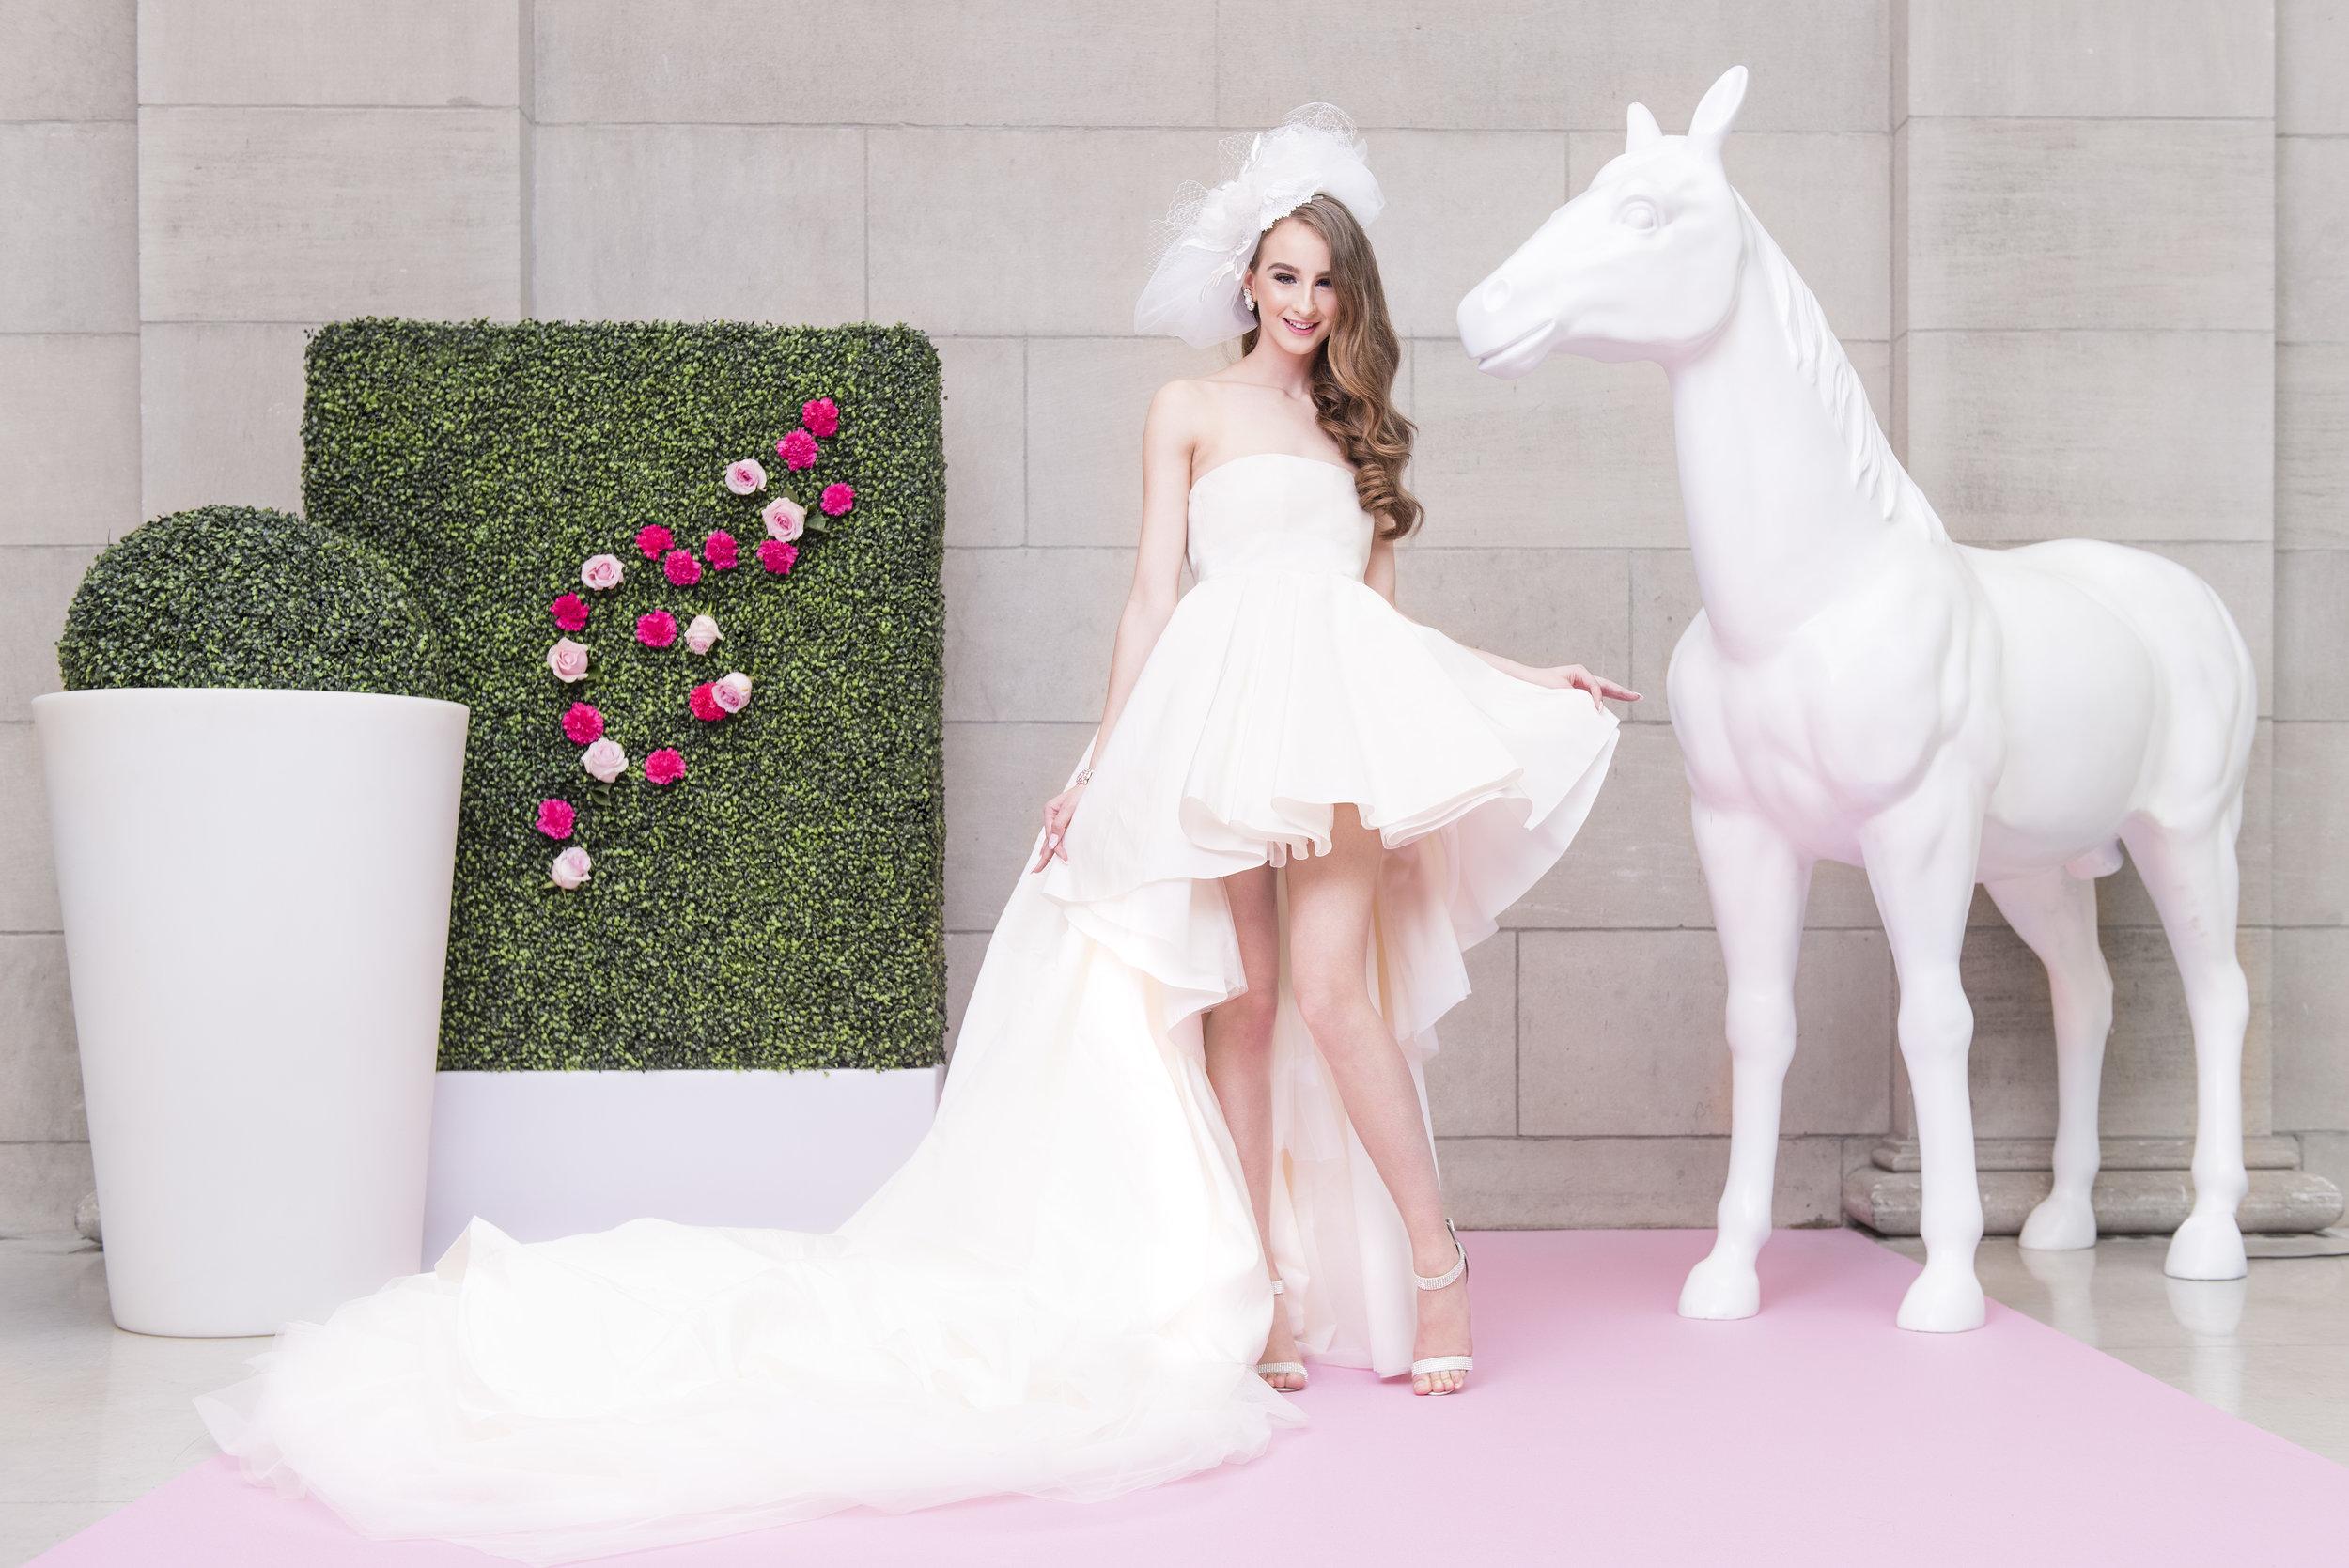 August In Bloom - Whimsical Bride - Dior Darling (Wedluxe)